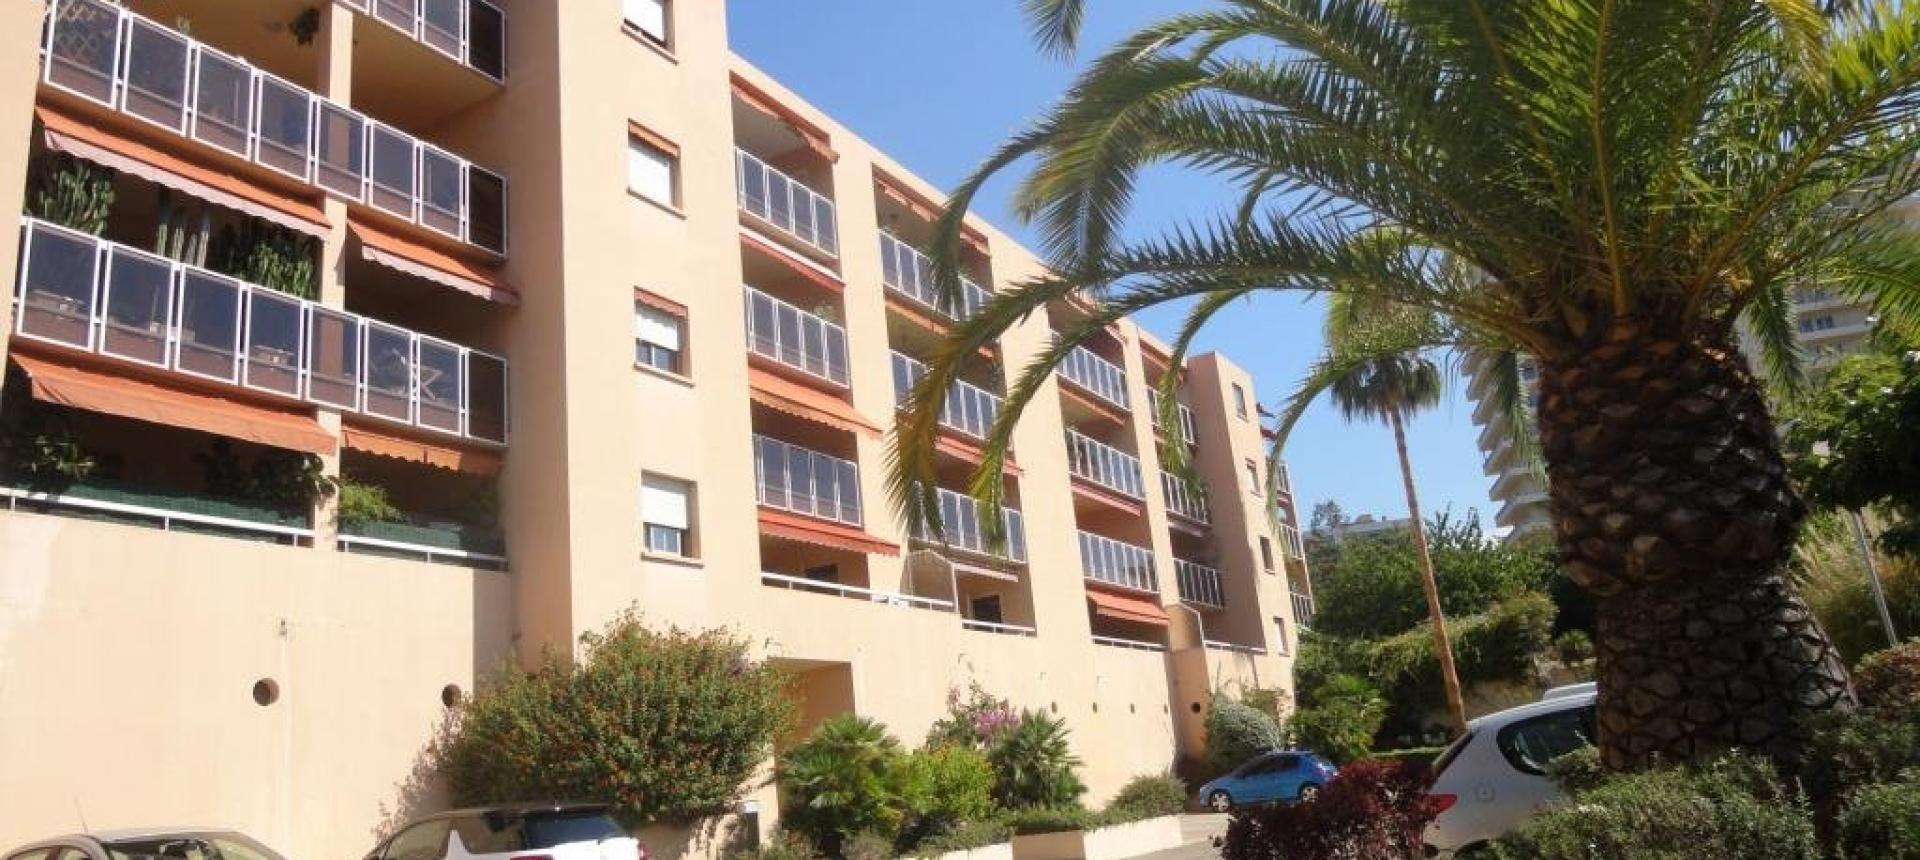 Immeuble, A vendre, appartement F3, Salario à Ajaccio en Corse